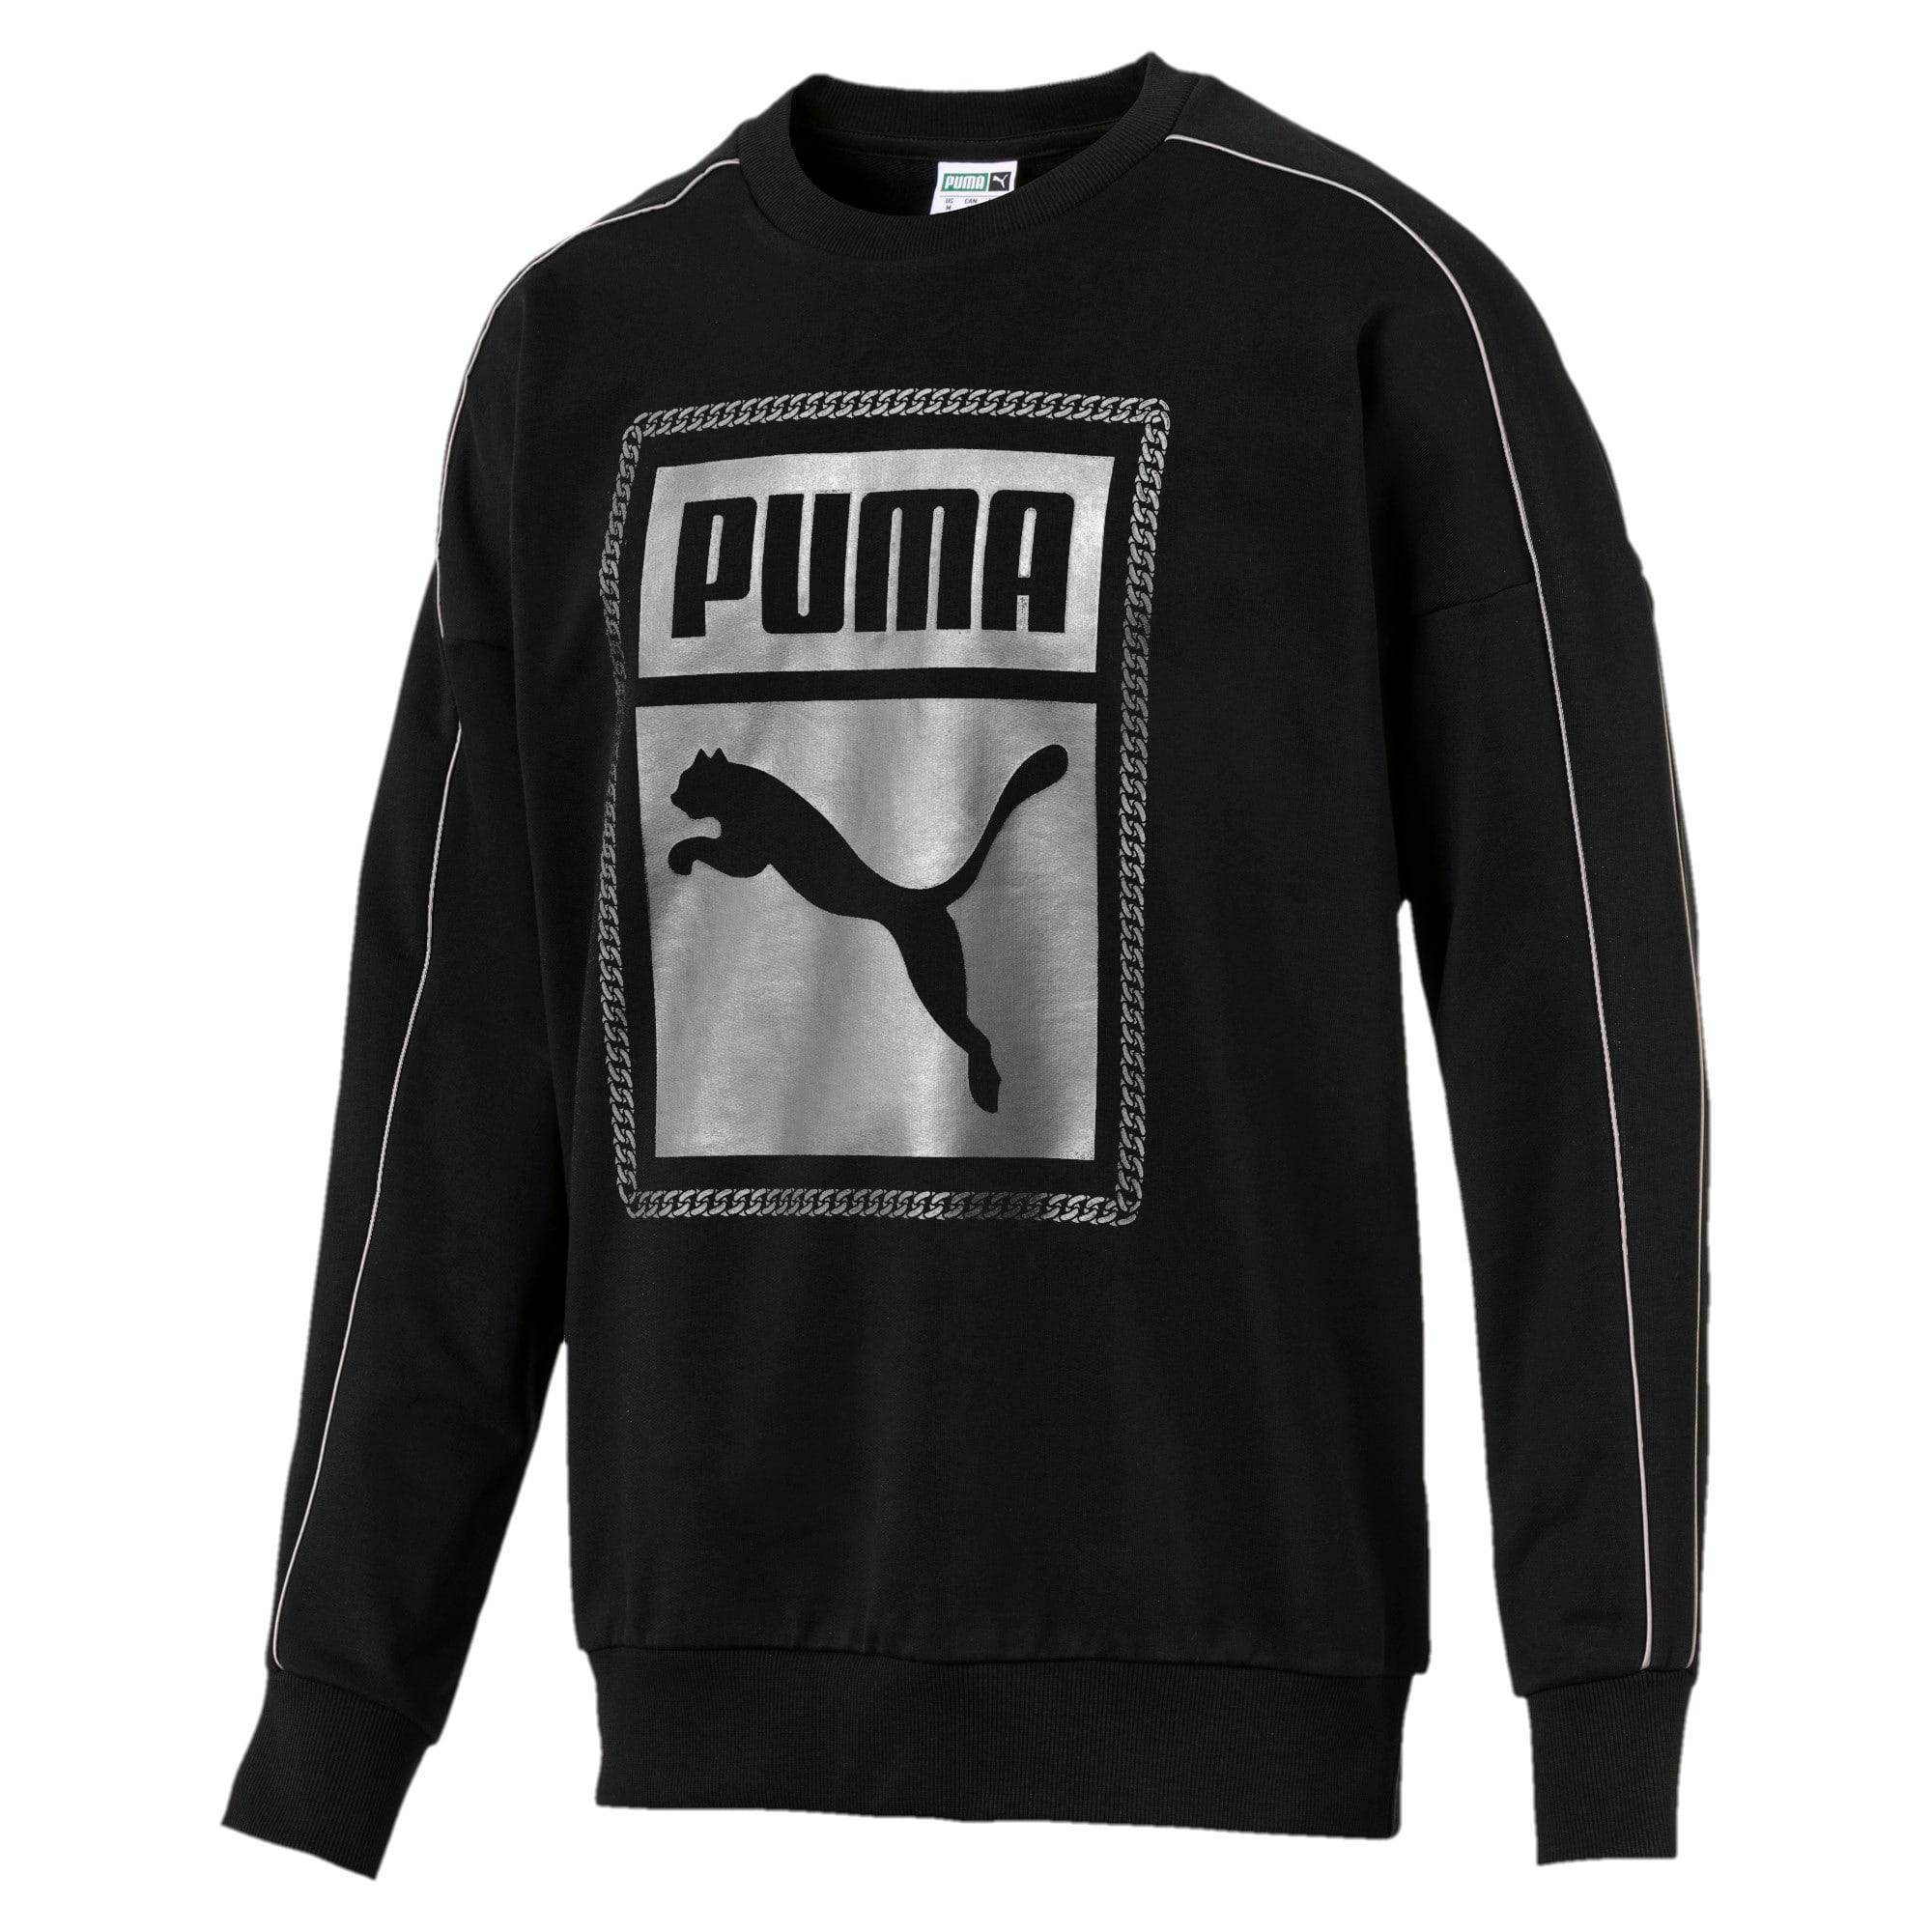 Thumbnail 1 of Chains Crew, Puma Black-2, medium